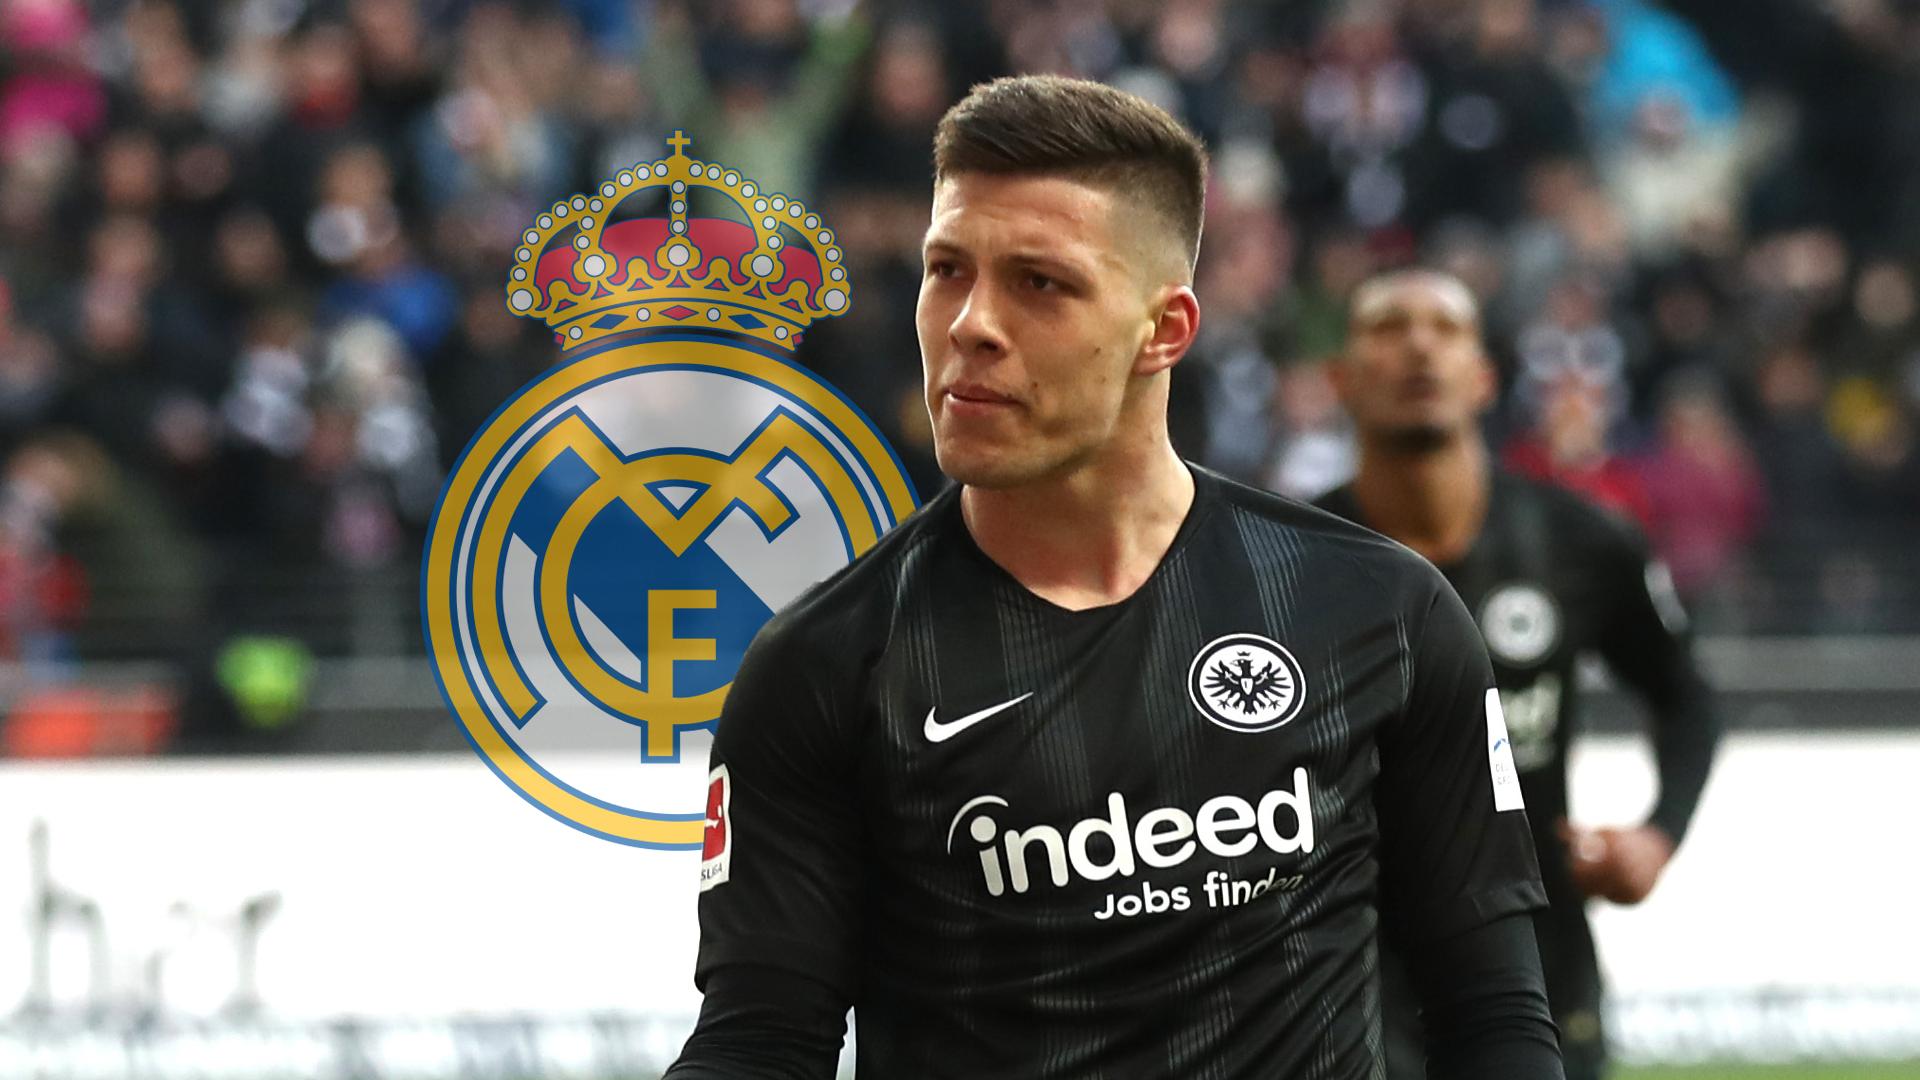 Officiel - Le Real Madrid recrute Luka Jovic pour six ans